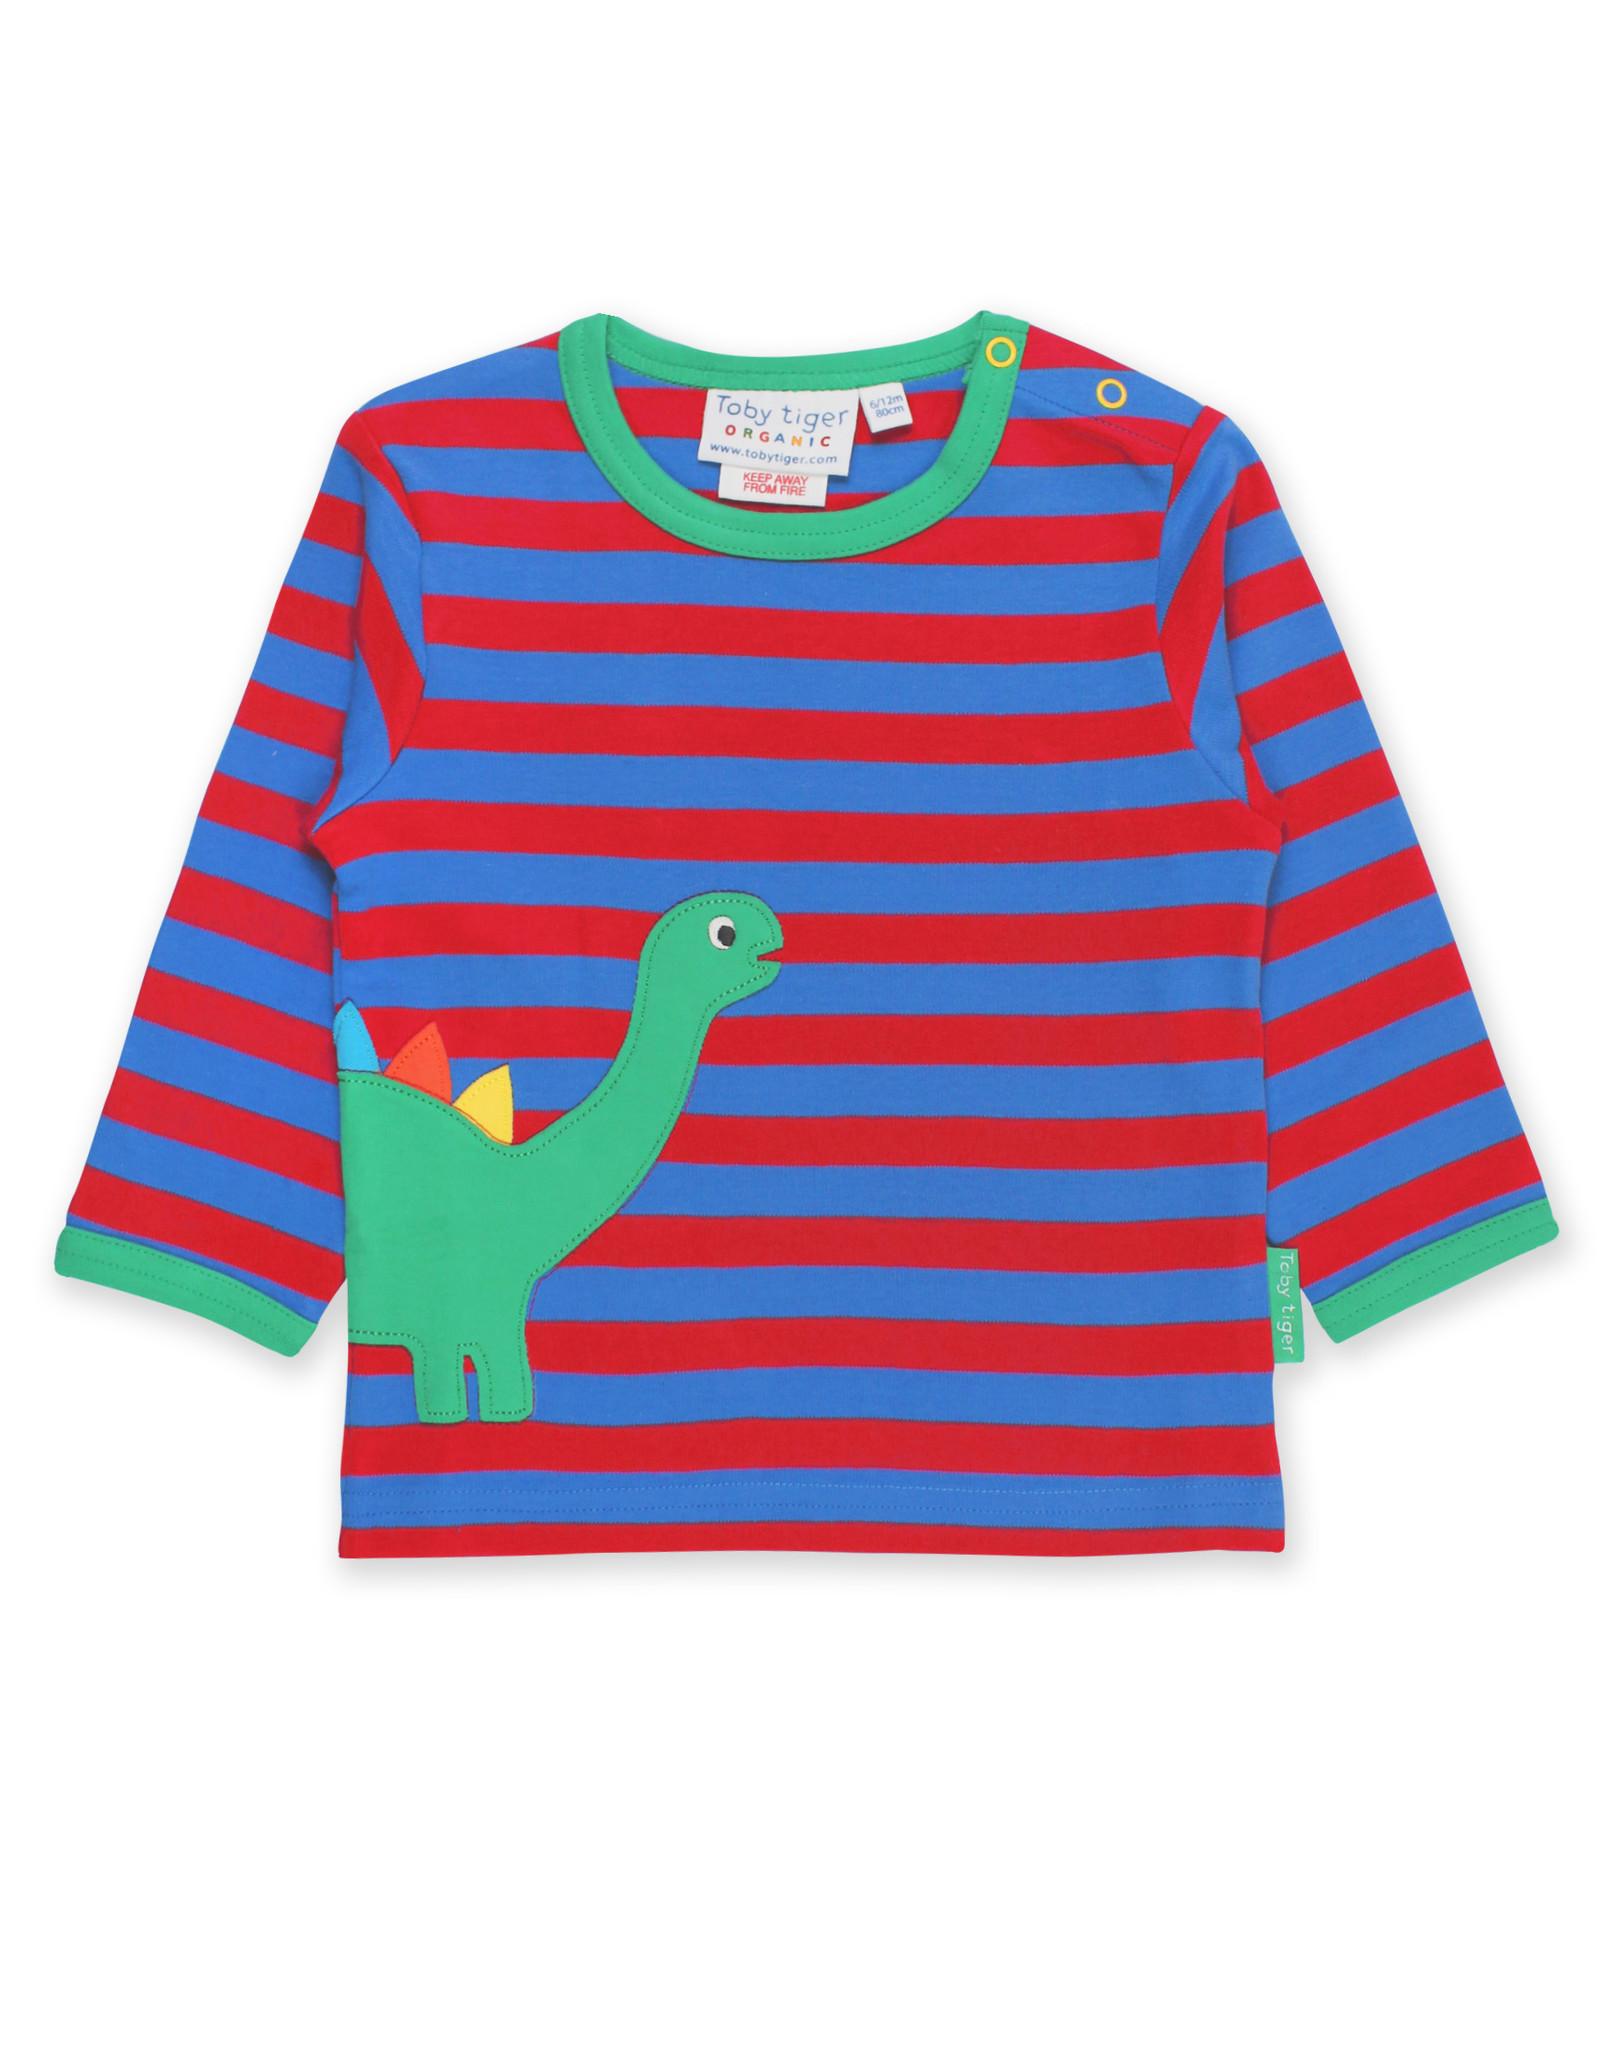 Toby Tiger Kids shirt - dino